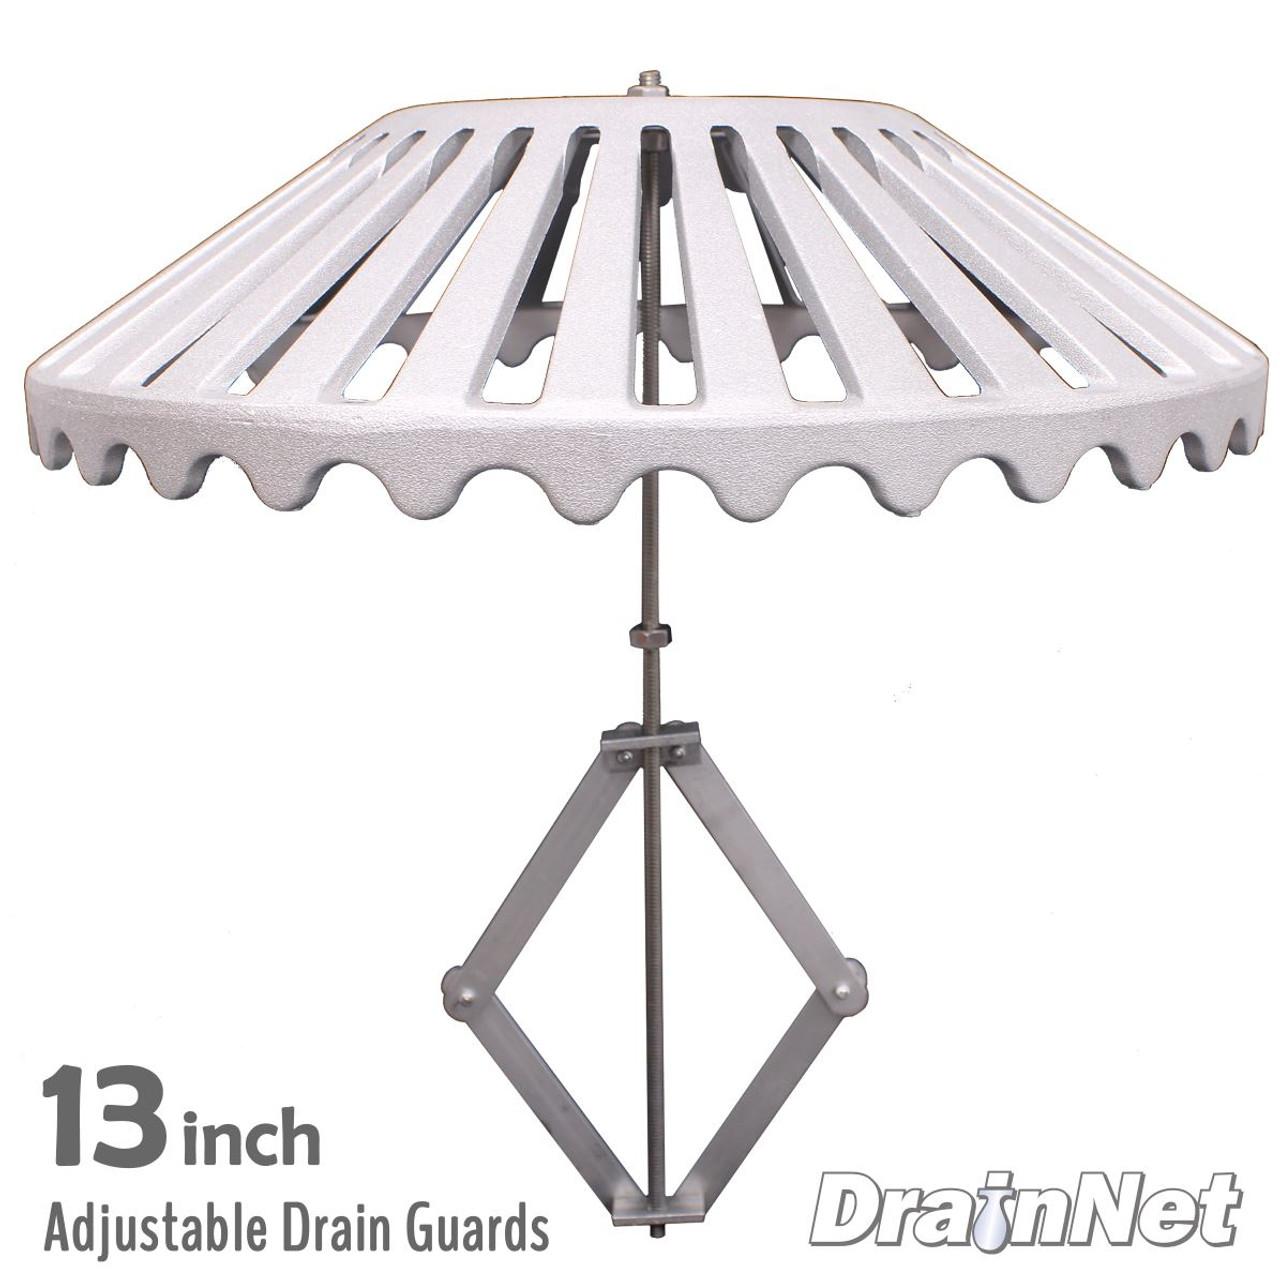 Adjustable Drain Guards - 13 inch (ADG‐1045)